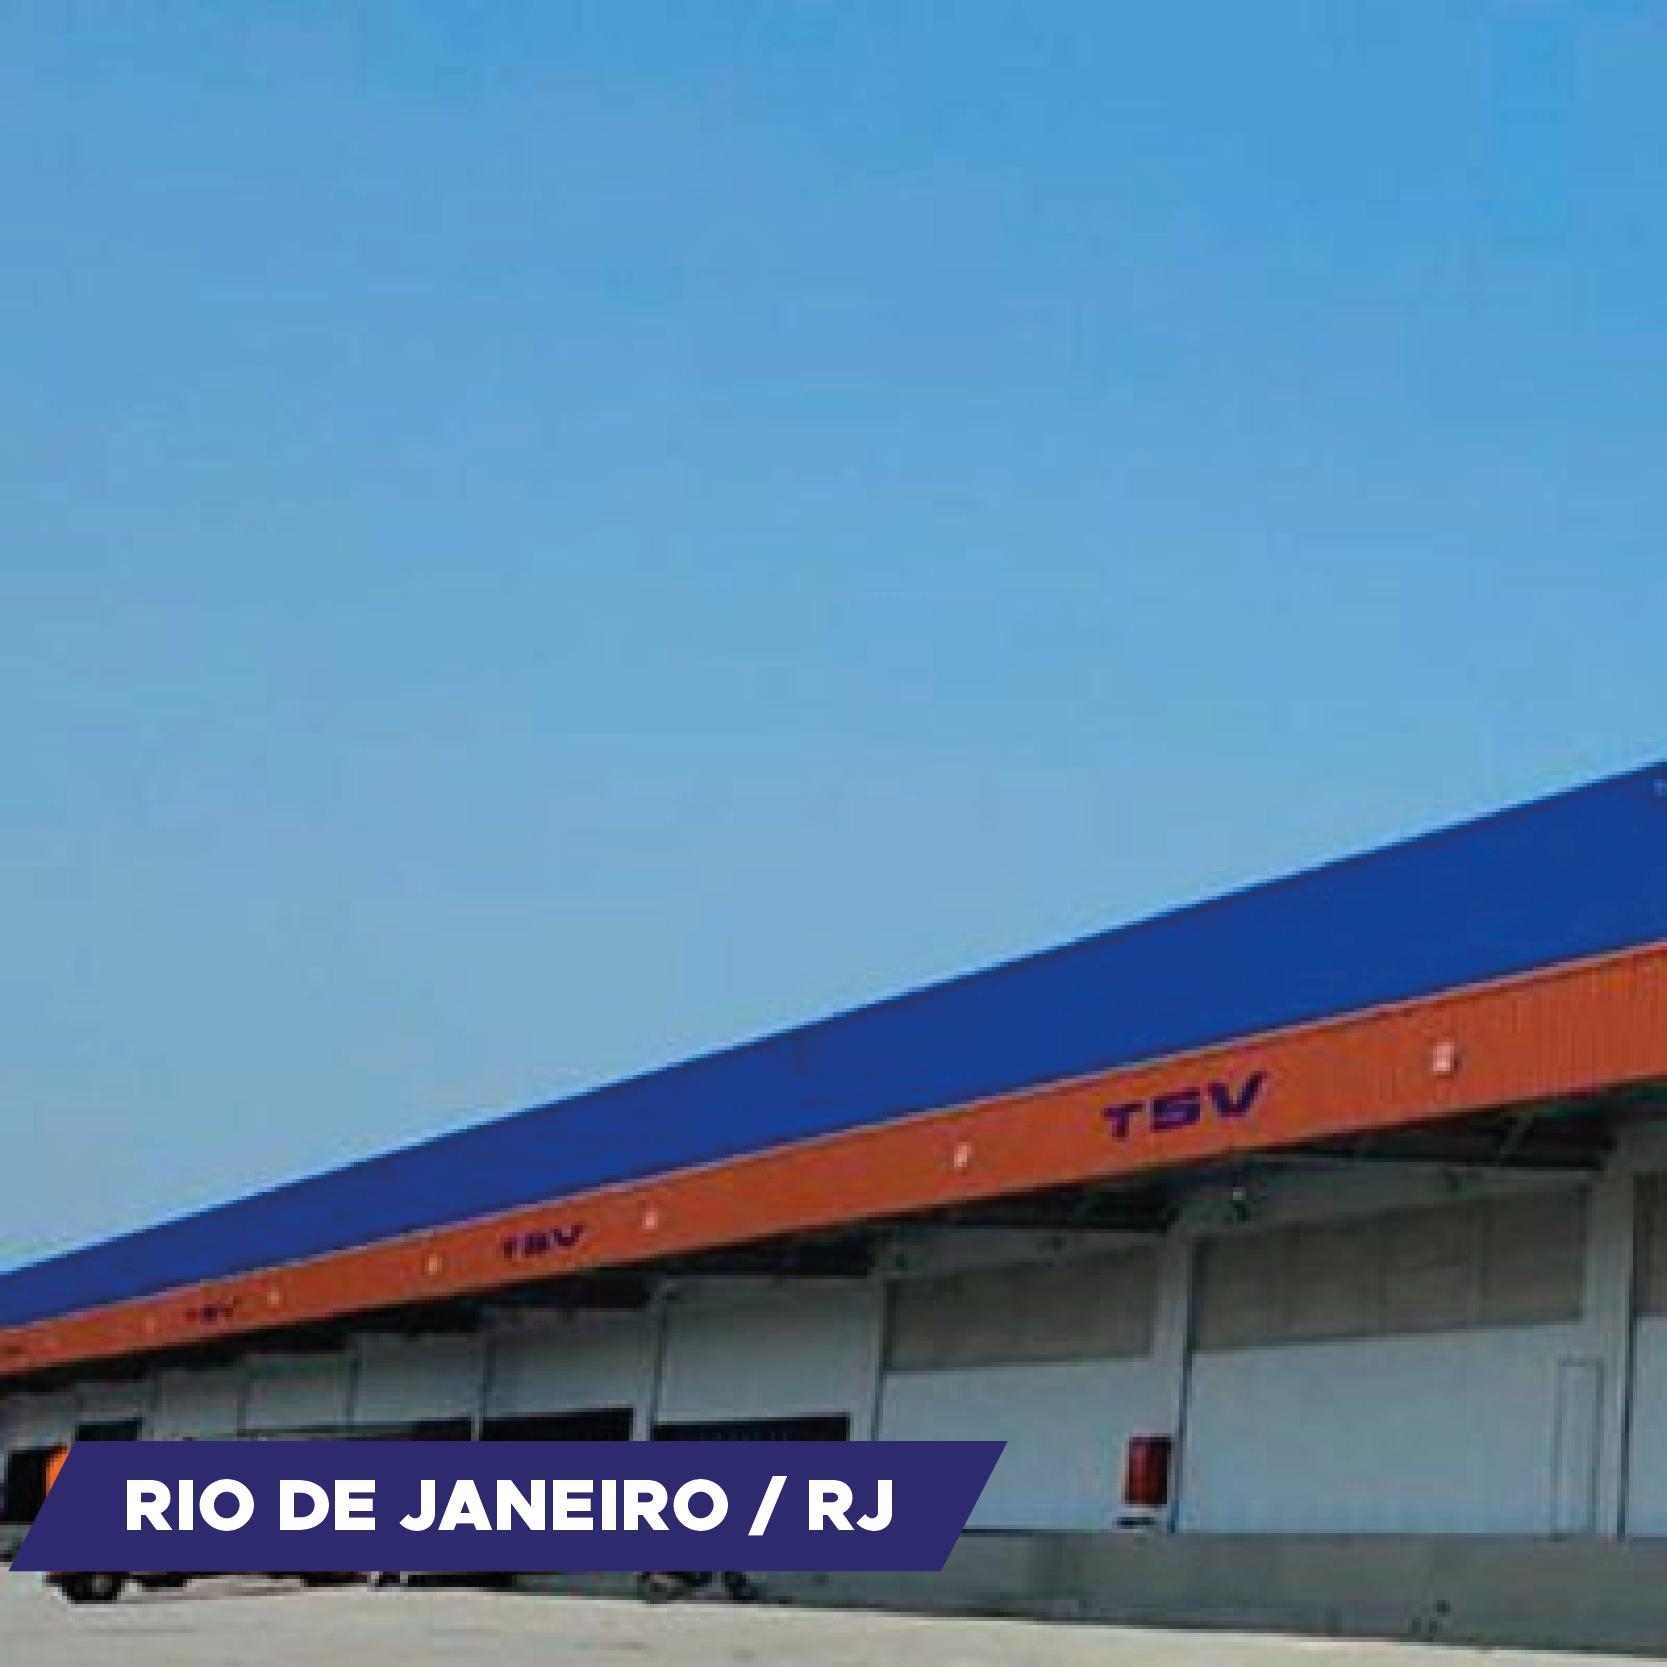 https://www.tsvtransportes.com.br/wp-content/uploads/2021/09/RIOSITE_Prancheta-1.png